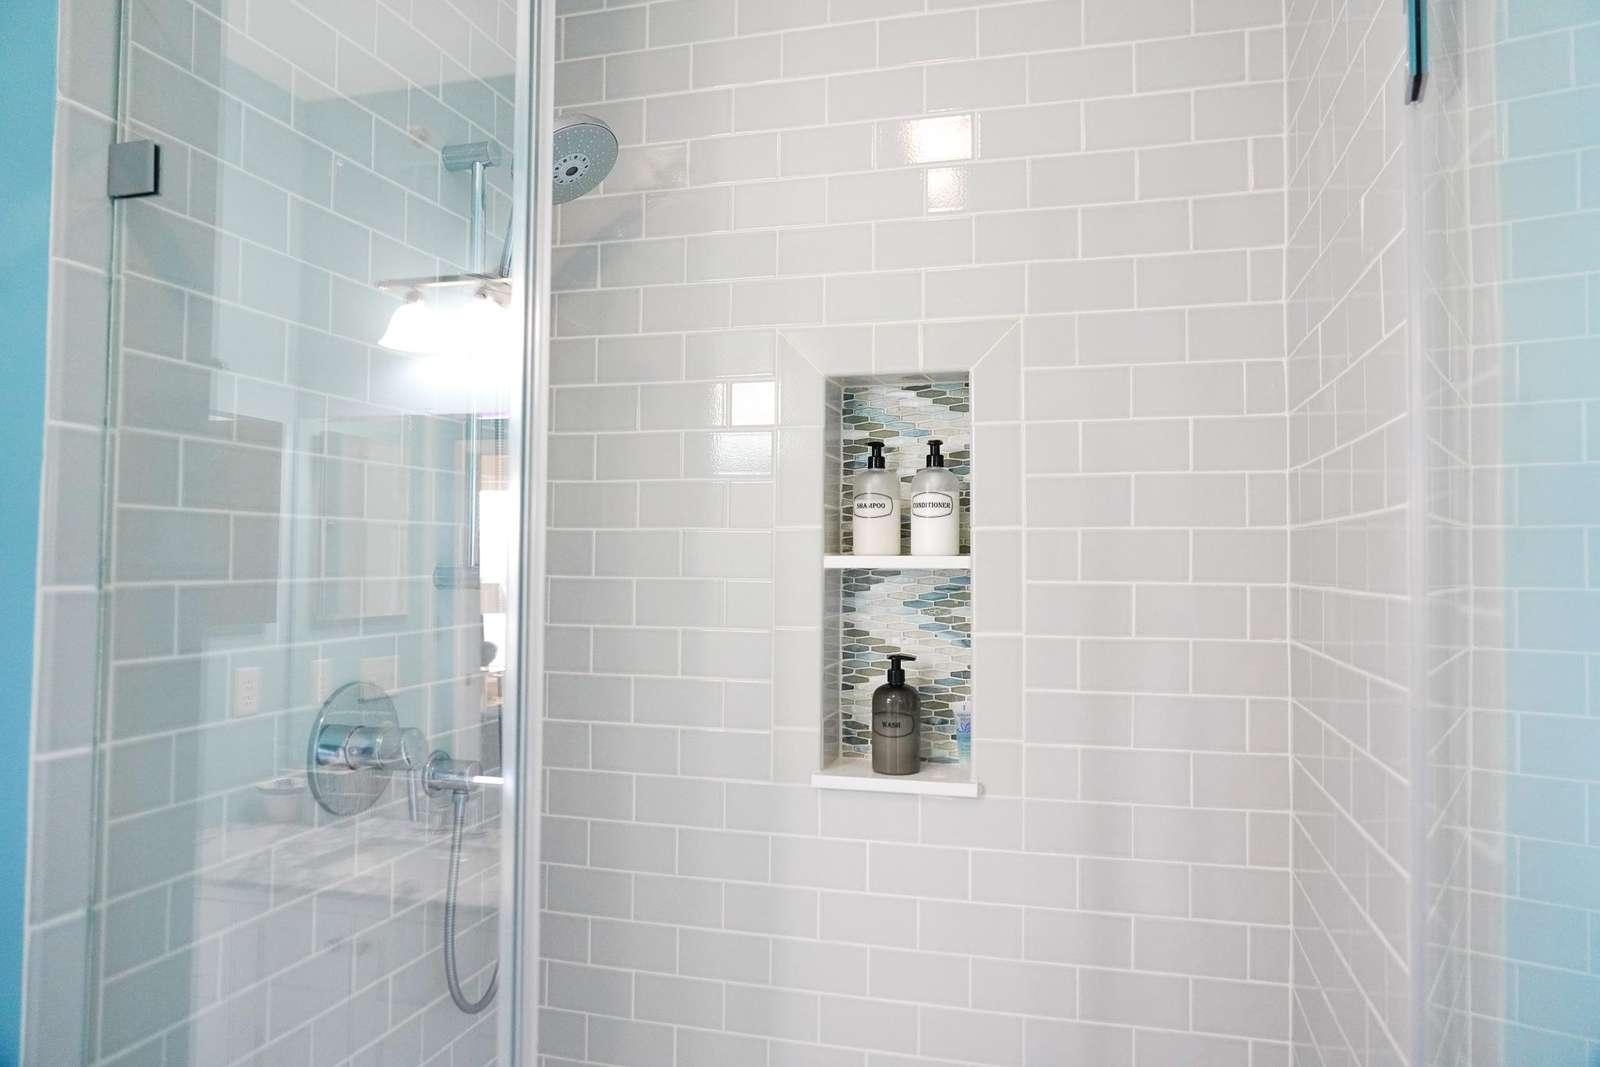 Bathroom in main bedroom